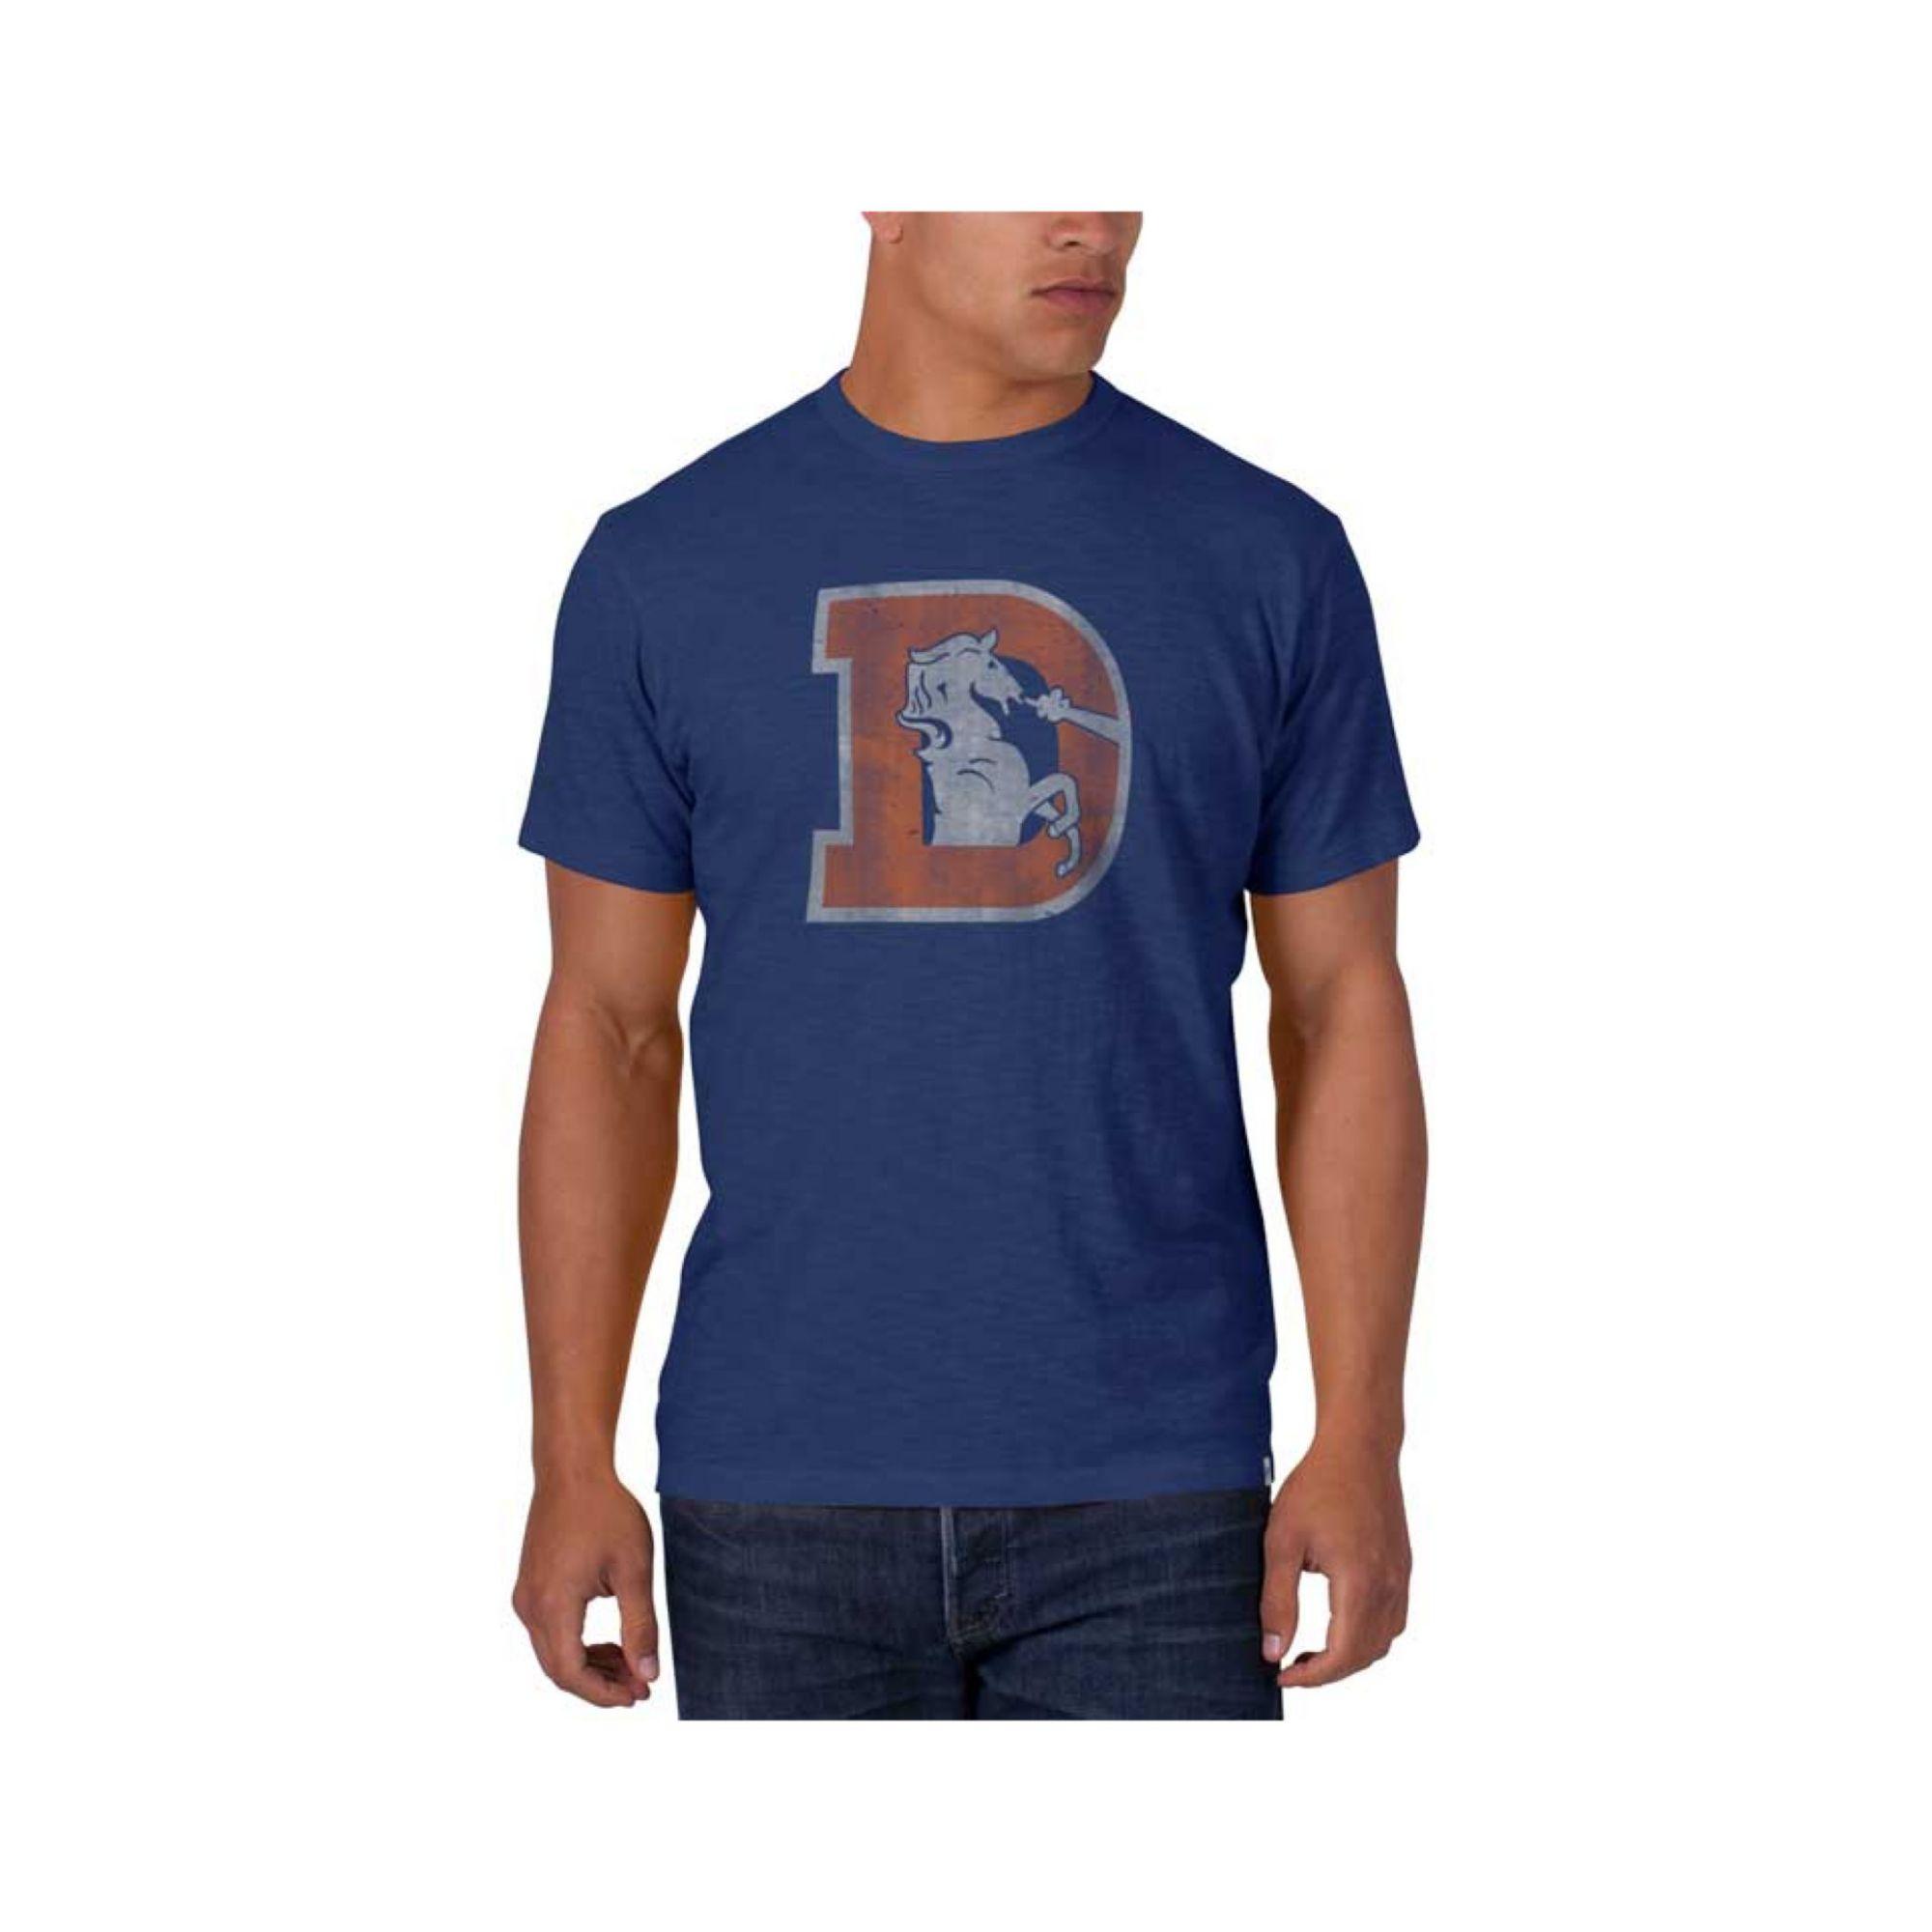 Retro Brand Nfl Shirts - BCD Tofu House 414bf278f